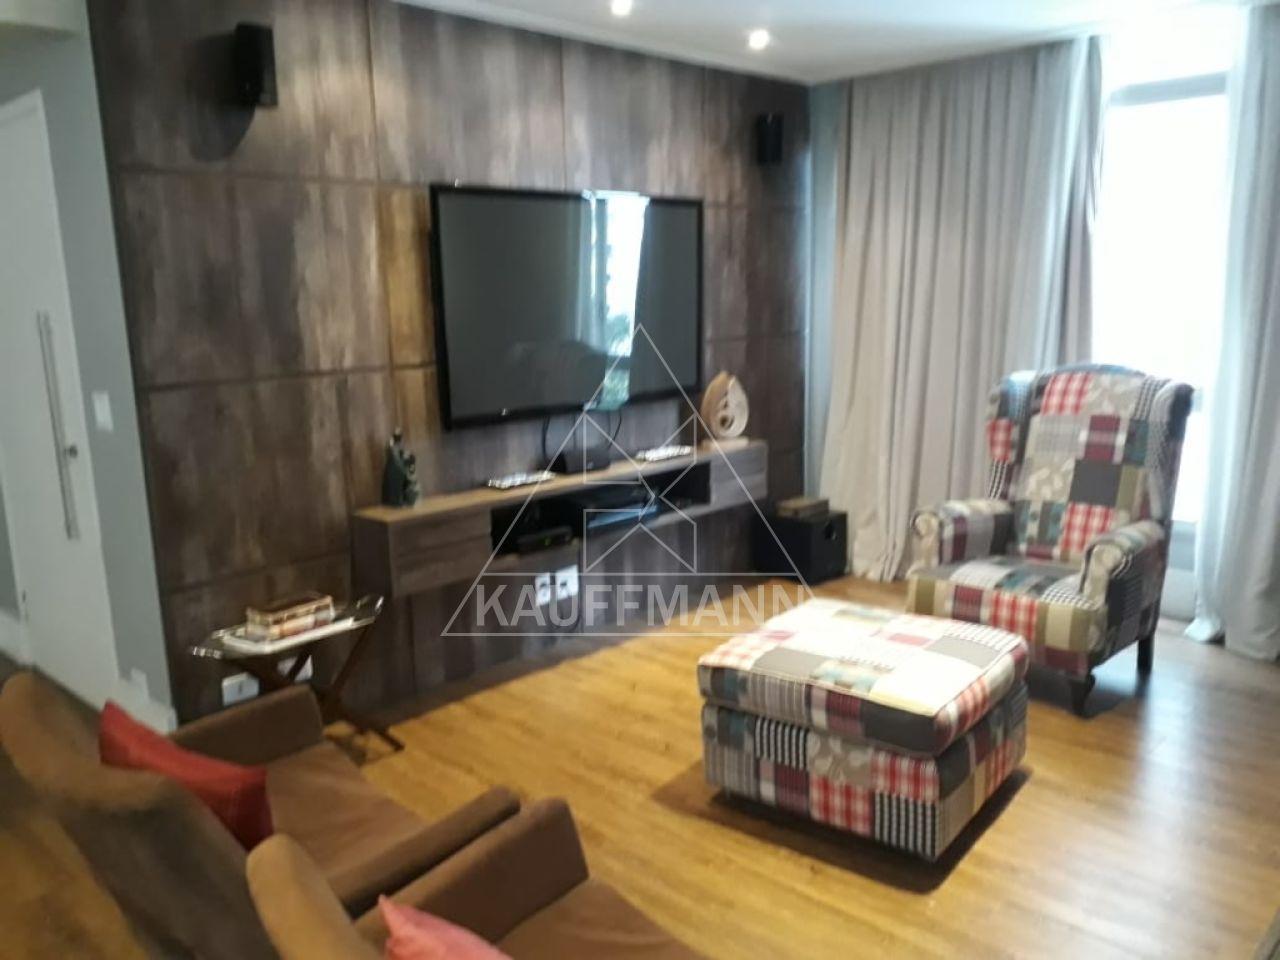 apartamento-venda-sao-paulo-jardim-paulista-3dormitorios-3suites-1vaga-174m2-Foto4